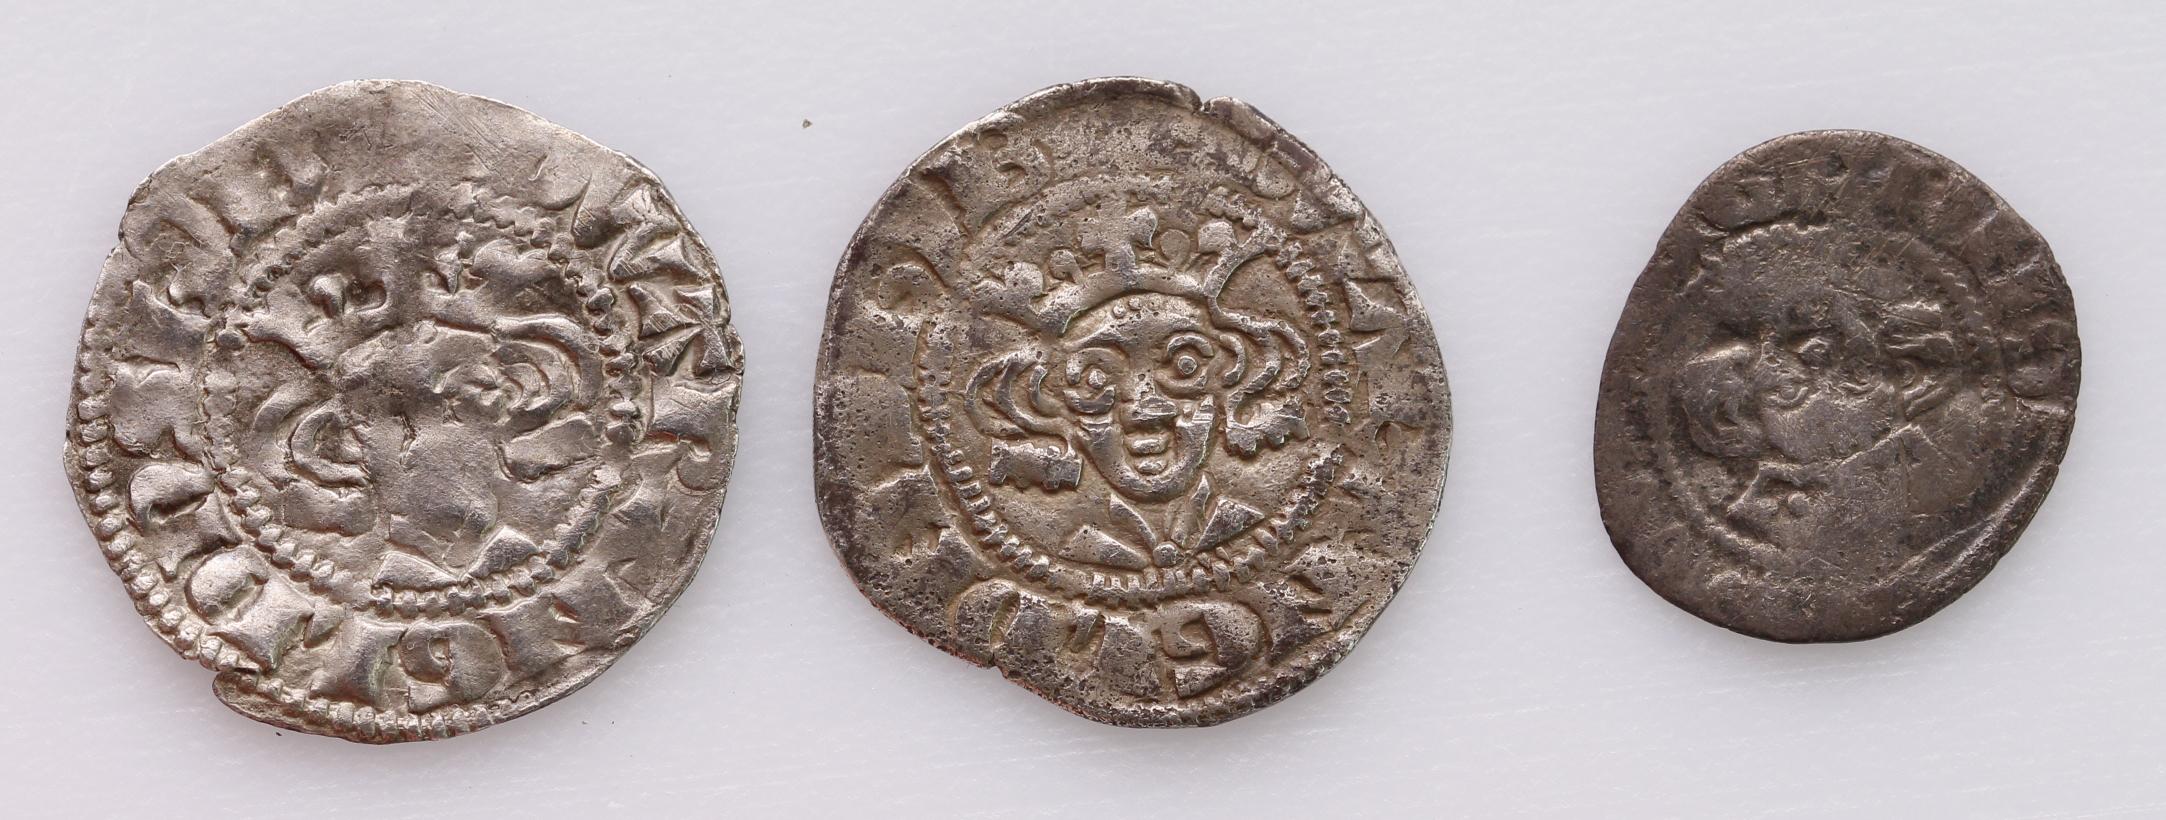 Edward I, Berwick-on-Tweed (3): Penny S1415, Blunt type III, 1.28g, nVF weak in places, small crack;